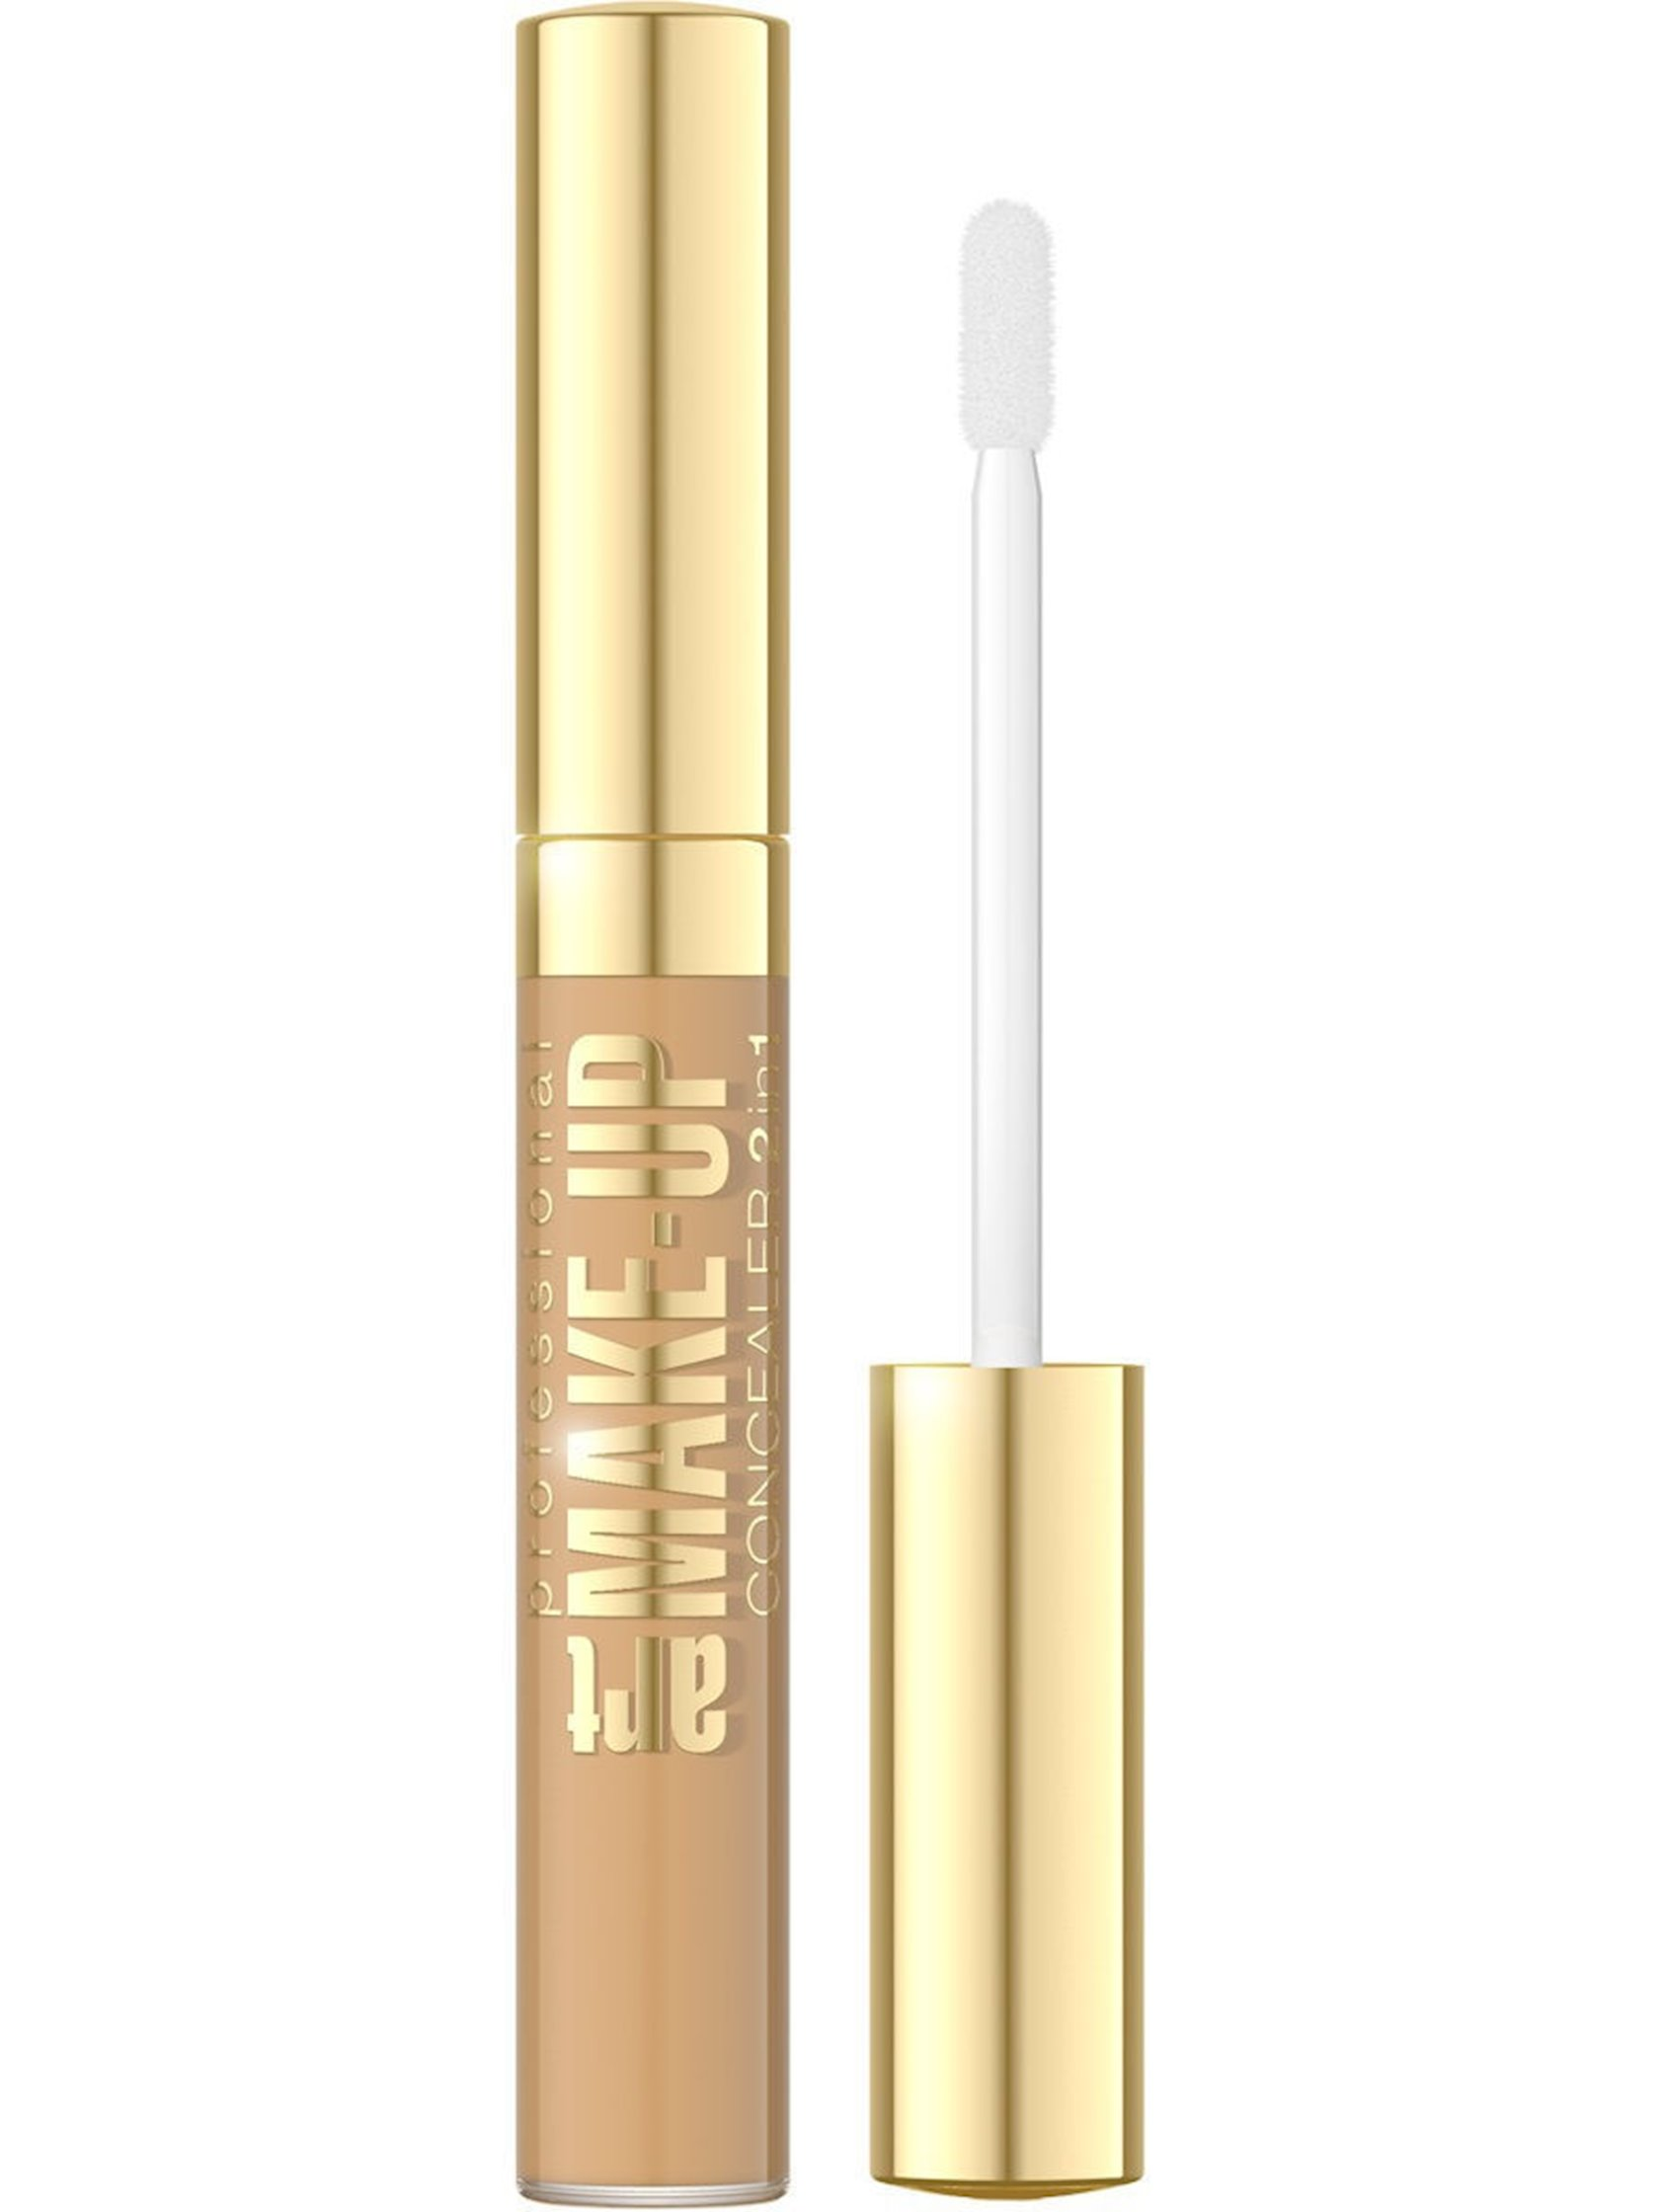 Göz ətrafı üçün korrektor Eveline Art Scenic Professional Make-Up 2 in 1 Nude 7 ml